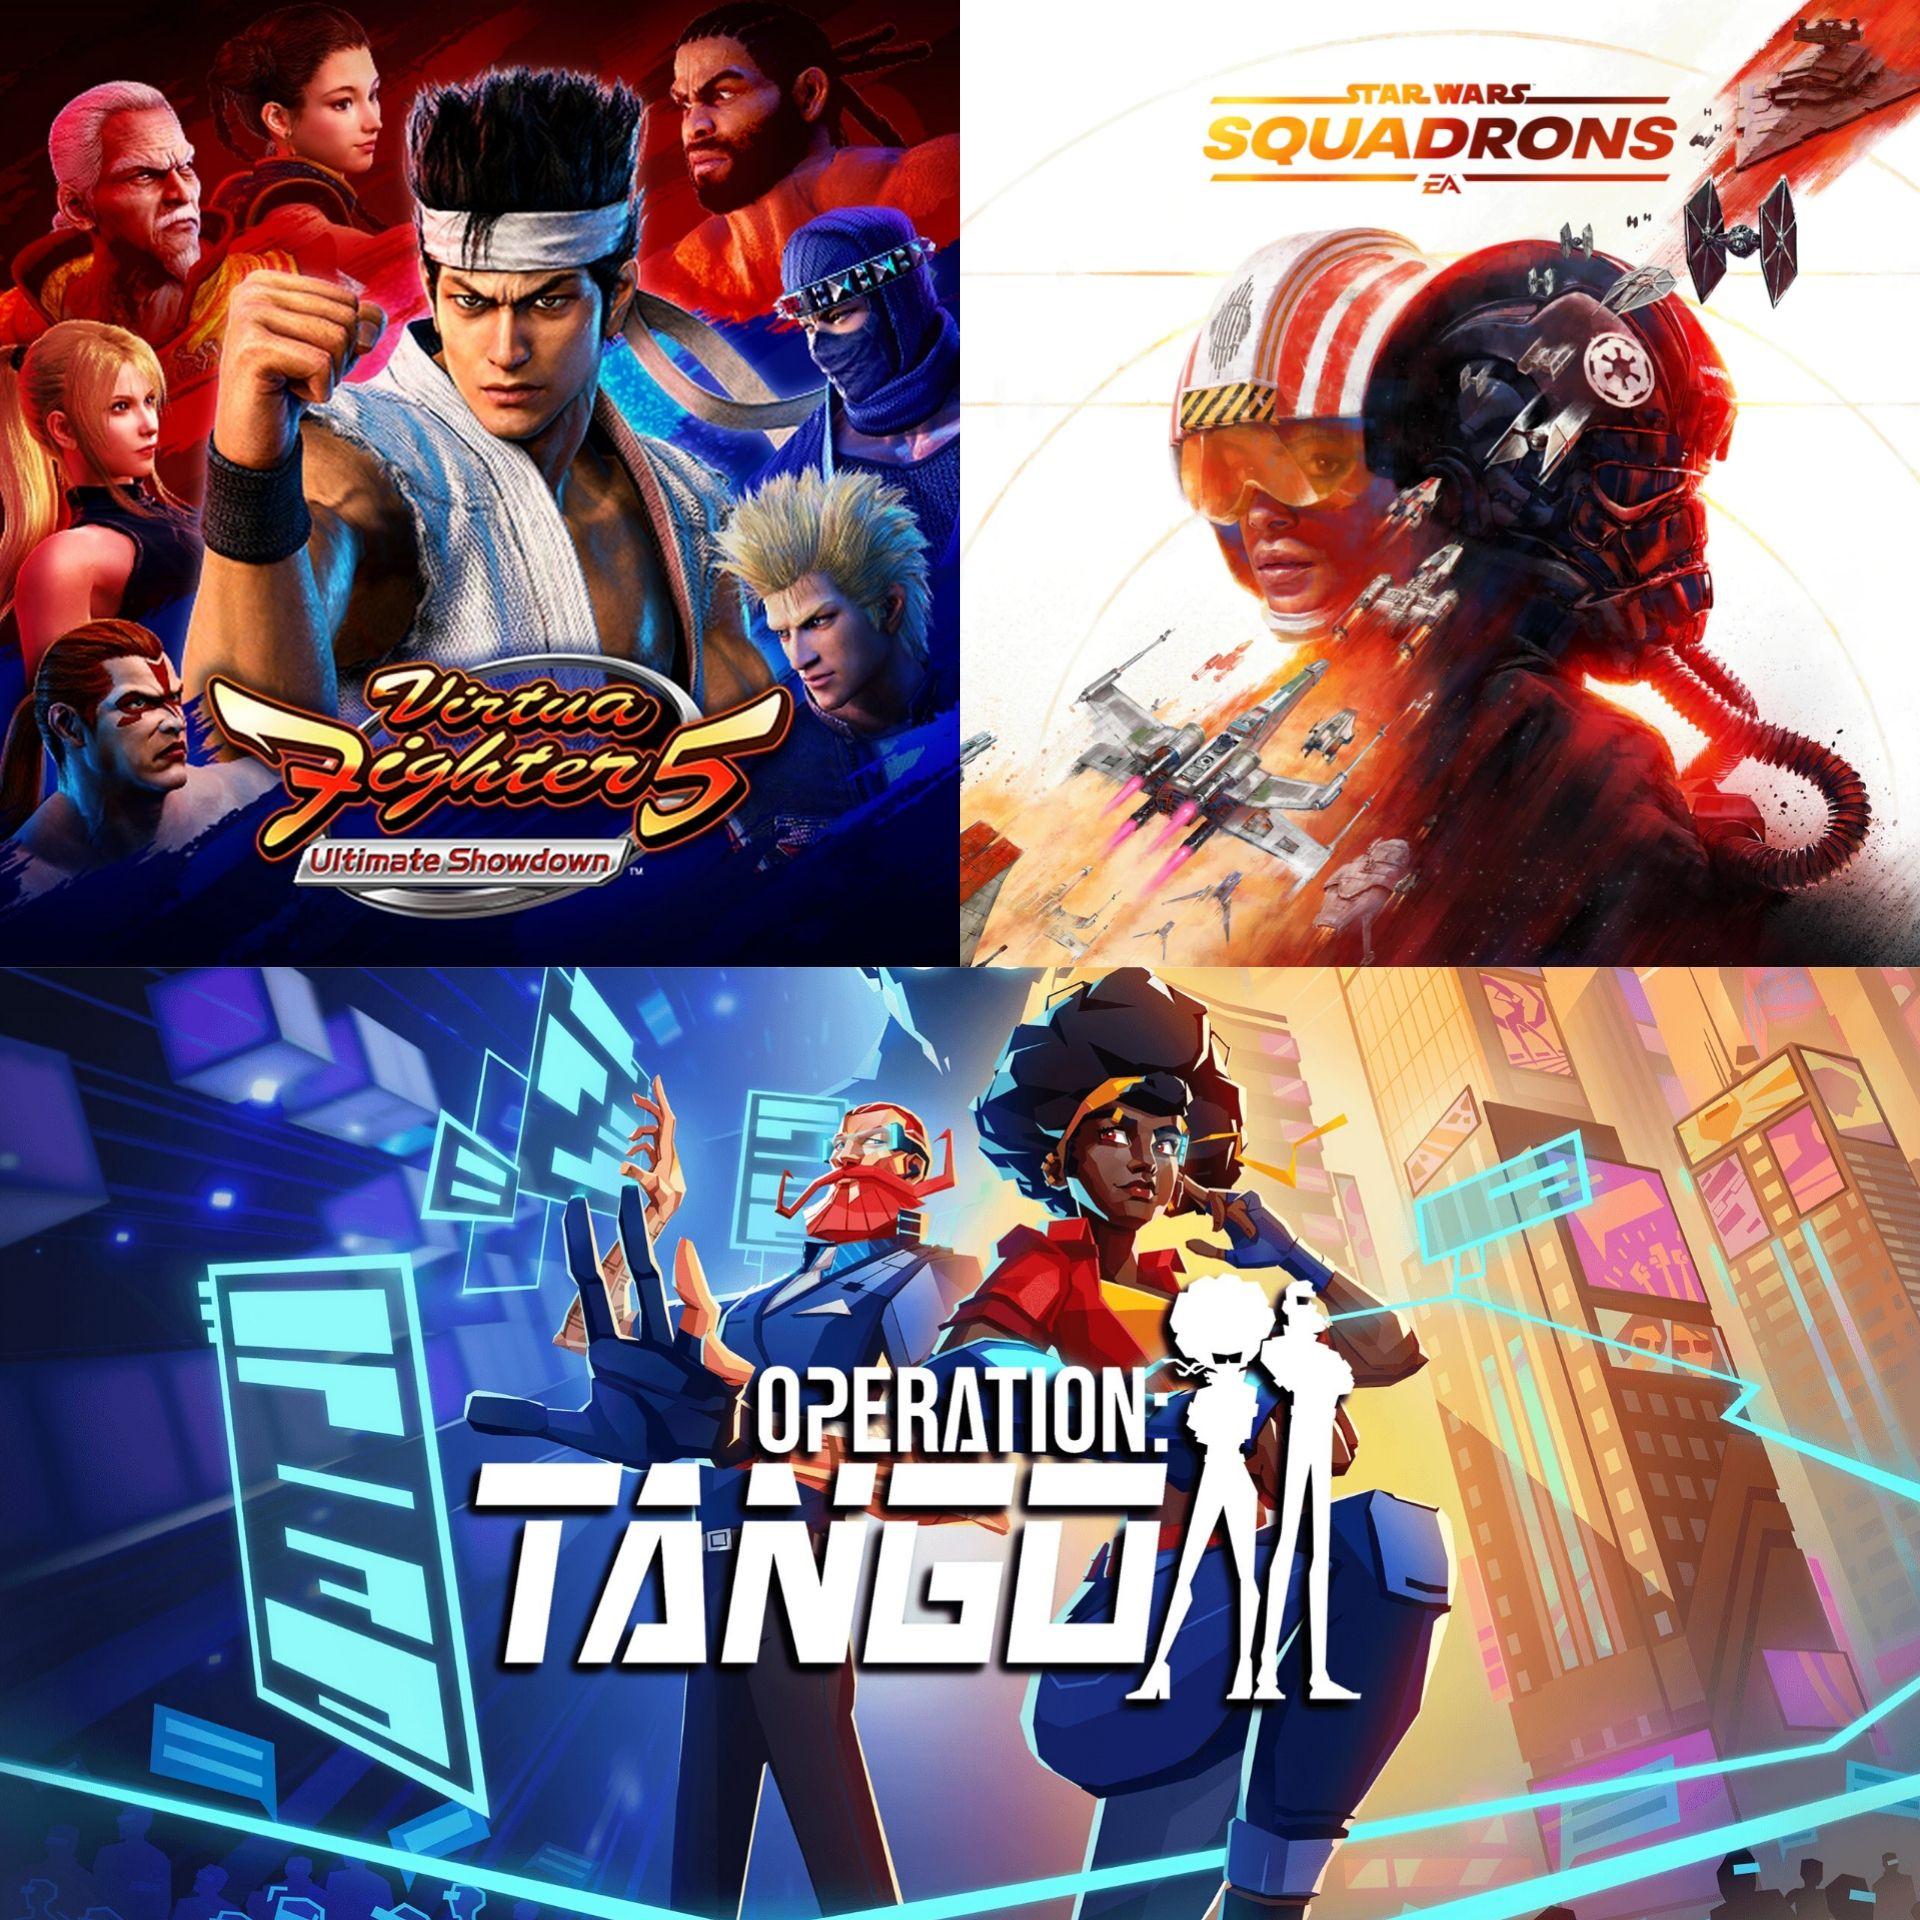 Star Wars: Squadrons (PS4), Virtua Fighter 5: Ultimate Showdown (PS4) & Operation: Tango (PS5) - Kostenlos via PS Plus (01.06)